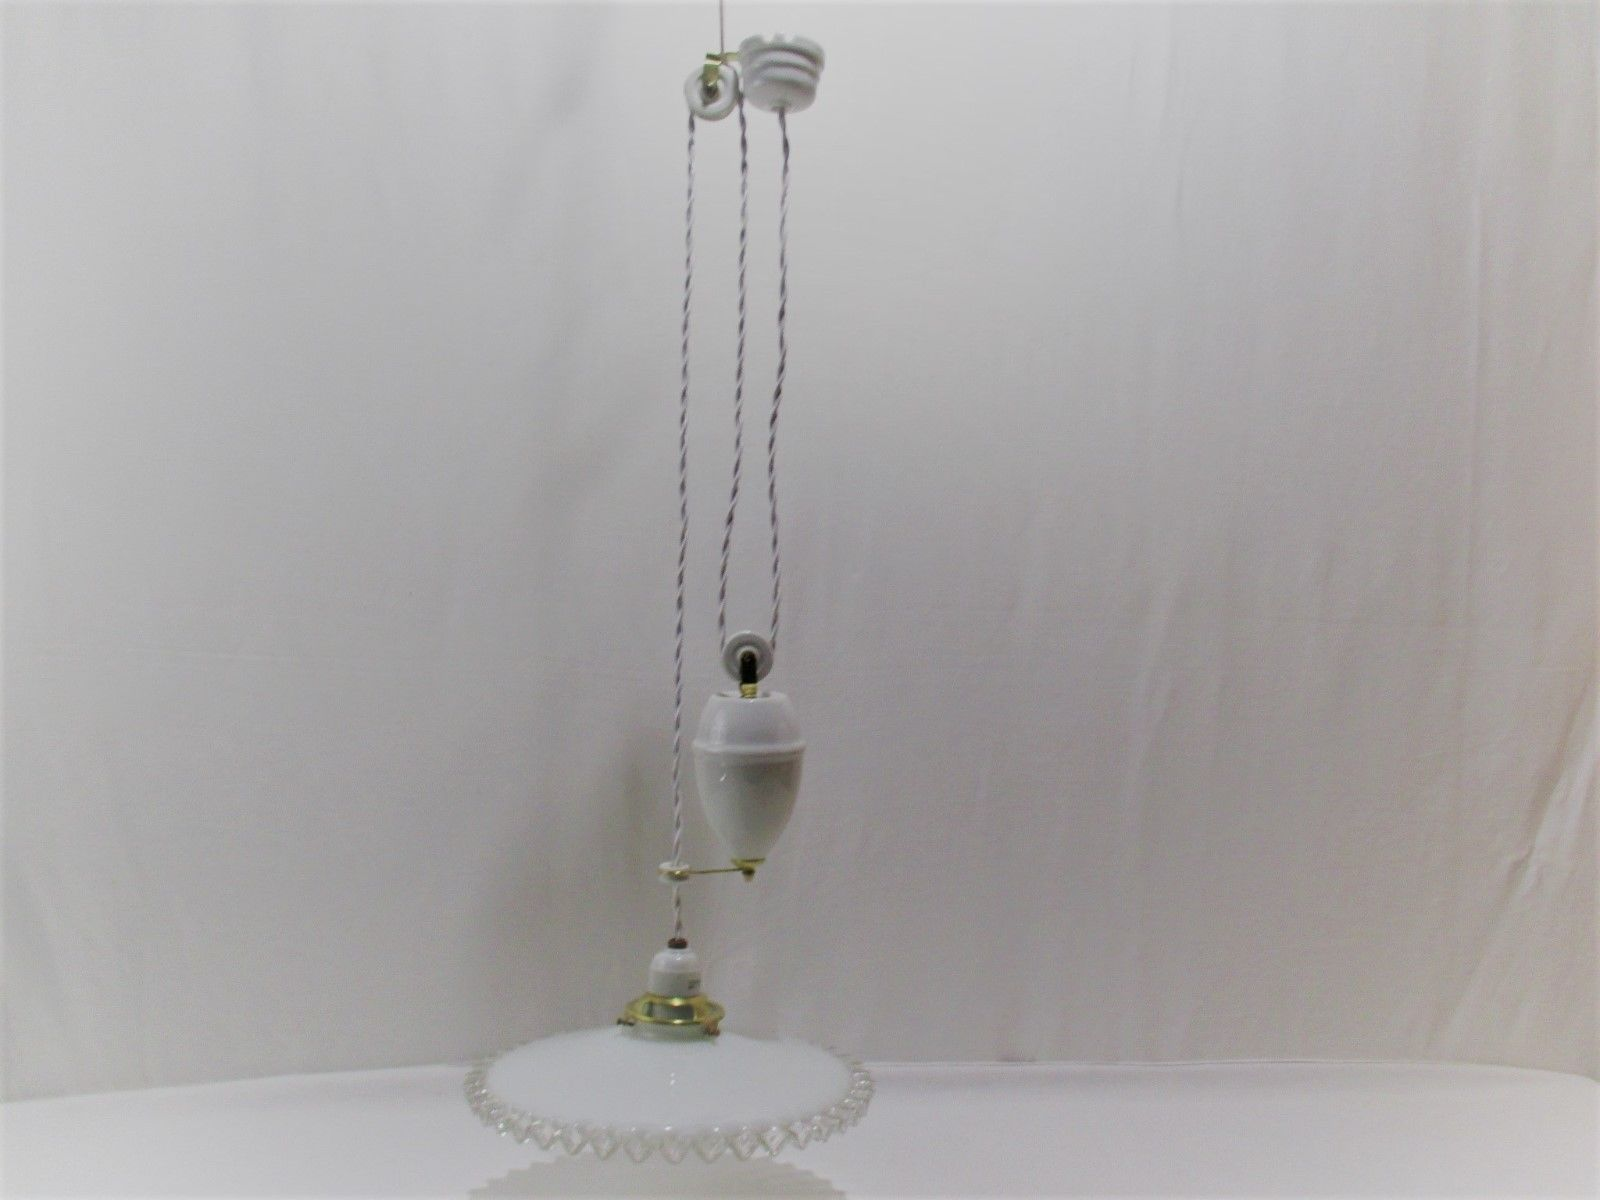 ancien monte et baisse lustre lampe suspension porcelaine opaline old lamp for sale eur 130 00. Black Bedroom Furniture Sets. Home Design Ideas